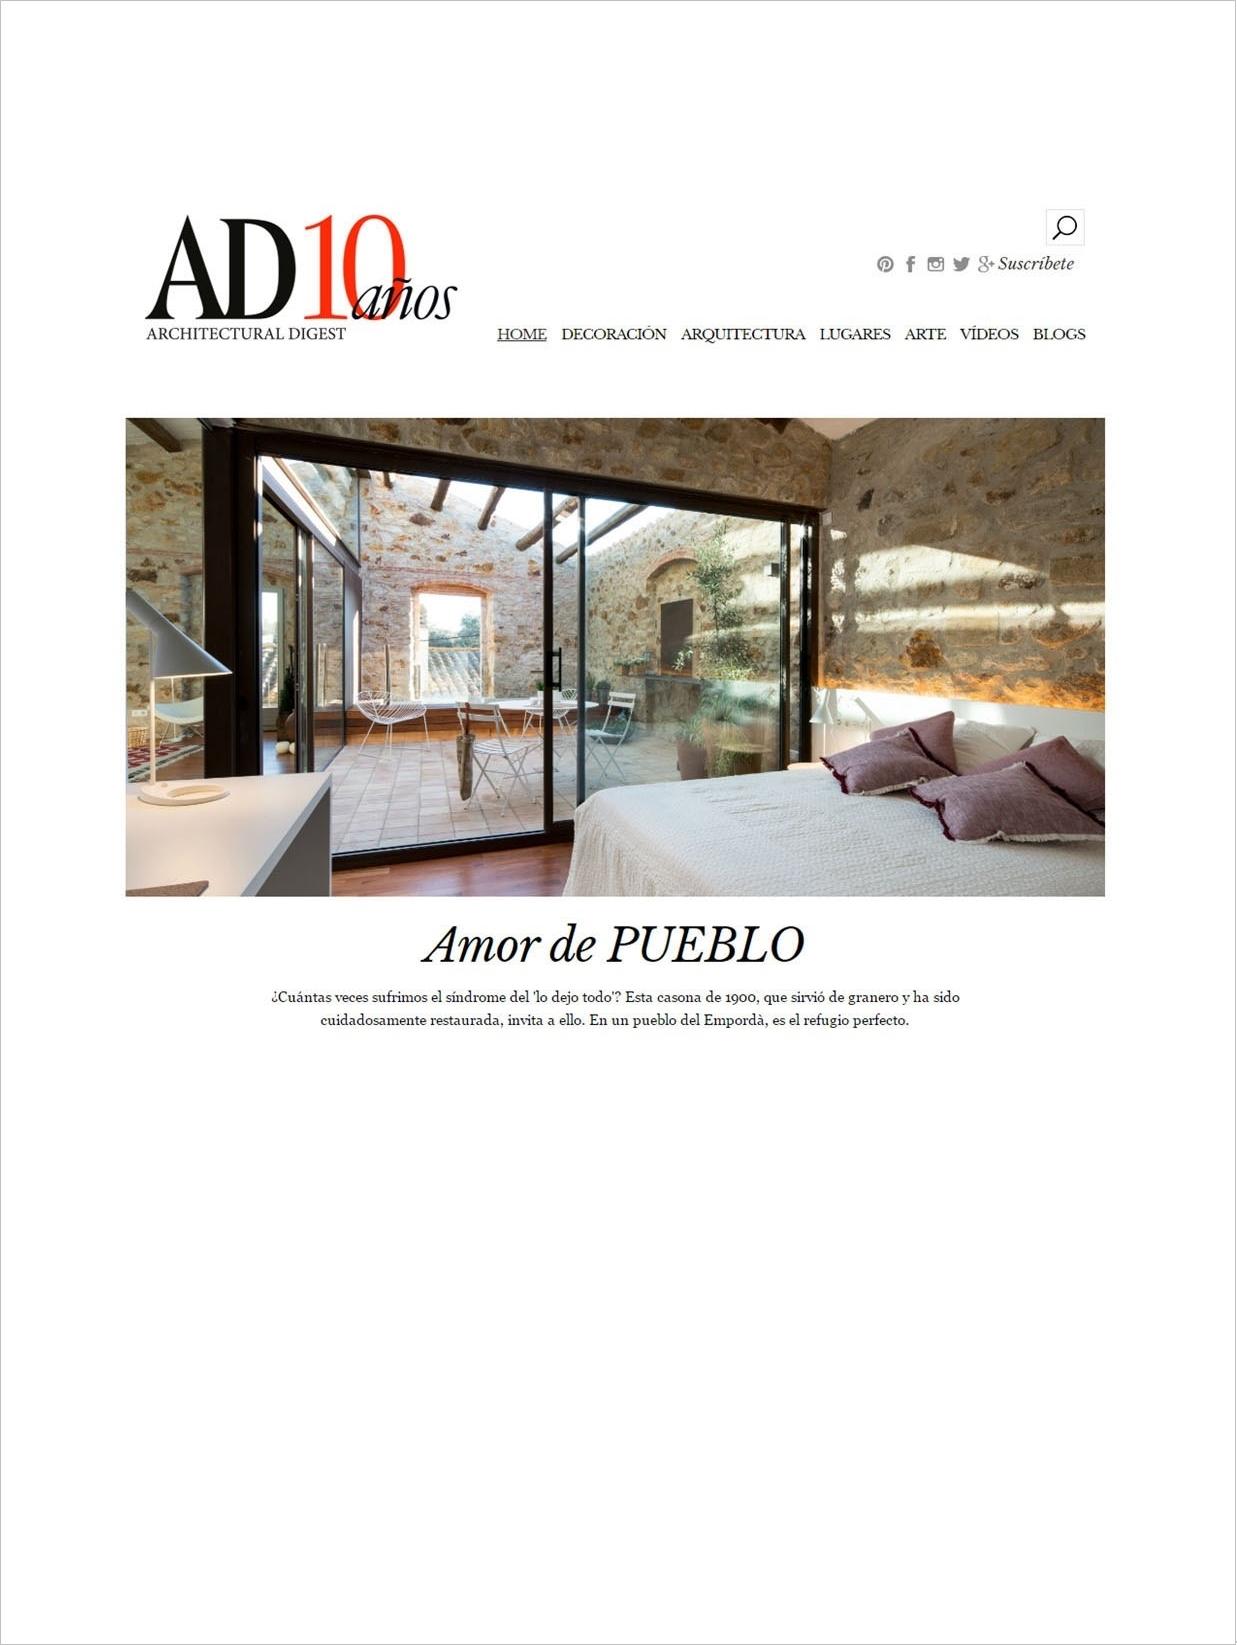 Portada_AD_España_revista_tras_samaria_14_pals_casa_en_venta_cases_singulars_emporda_2